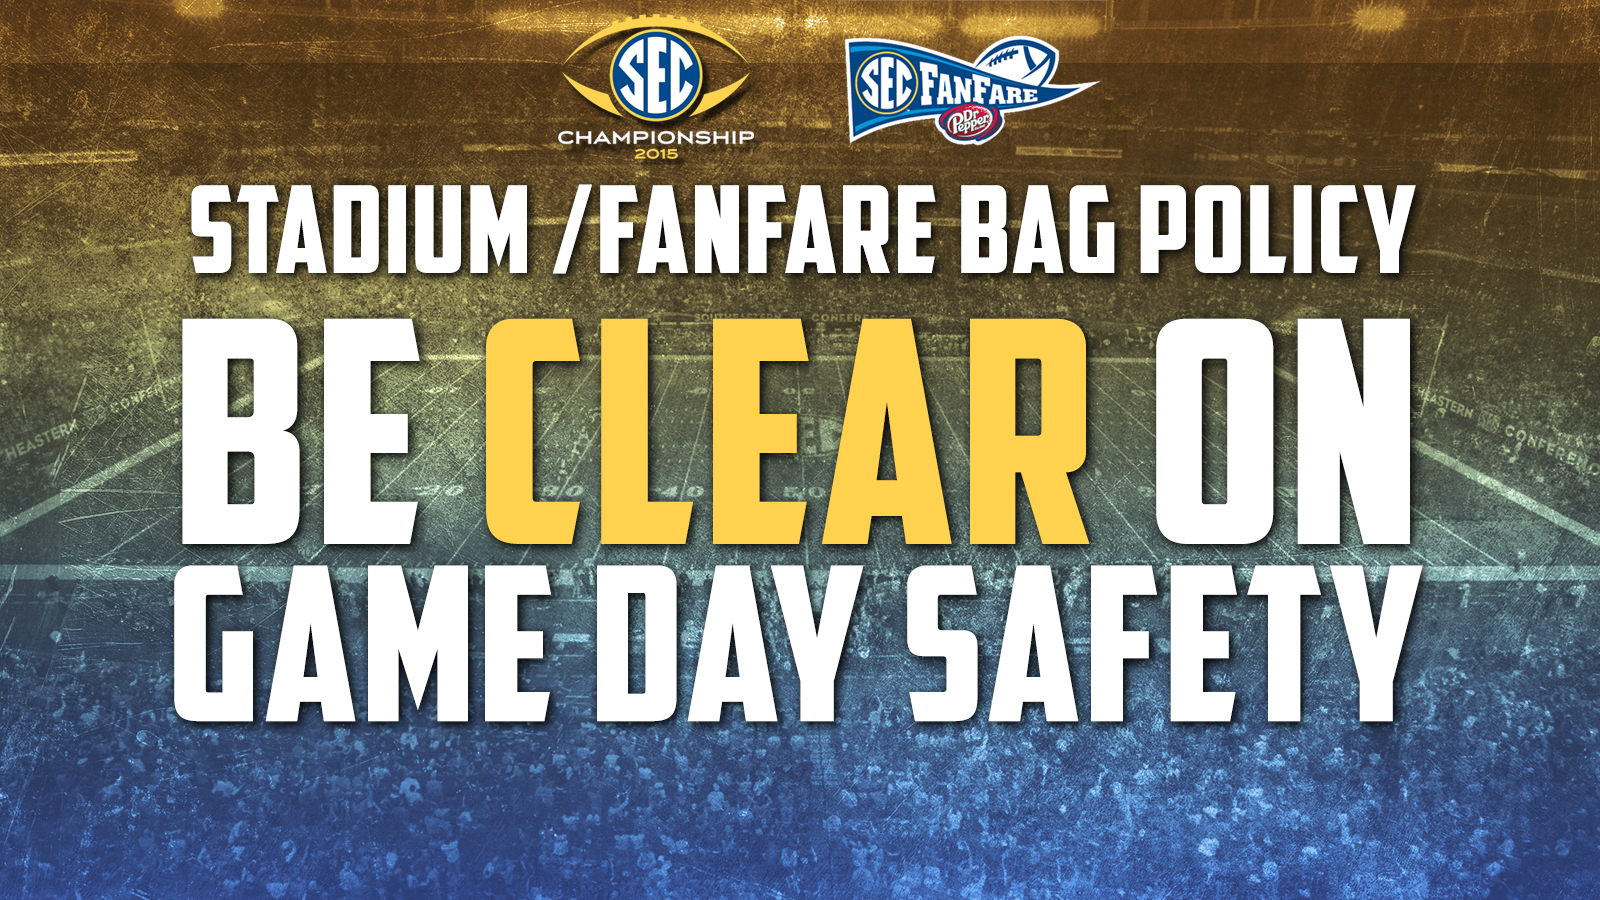 SEC Enhances Security at Football Championship Weekend